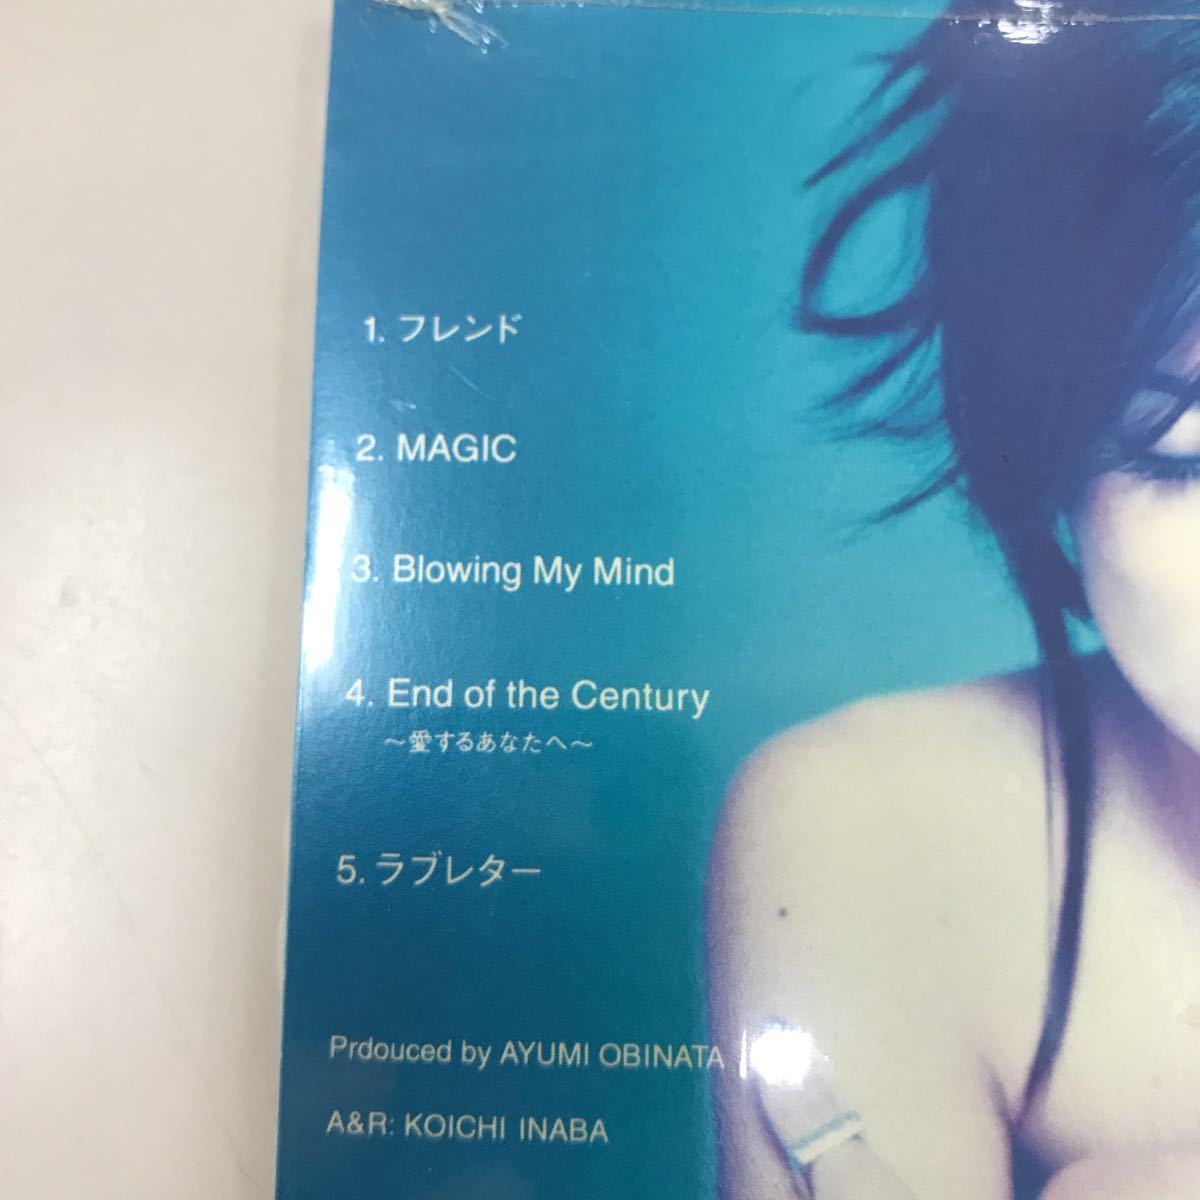 CD 中古☆【邦楽】平子理沙 ロッタラブ